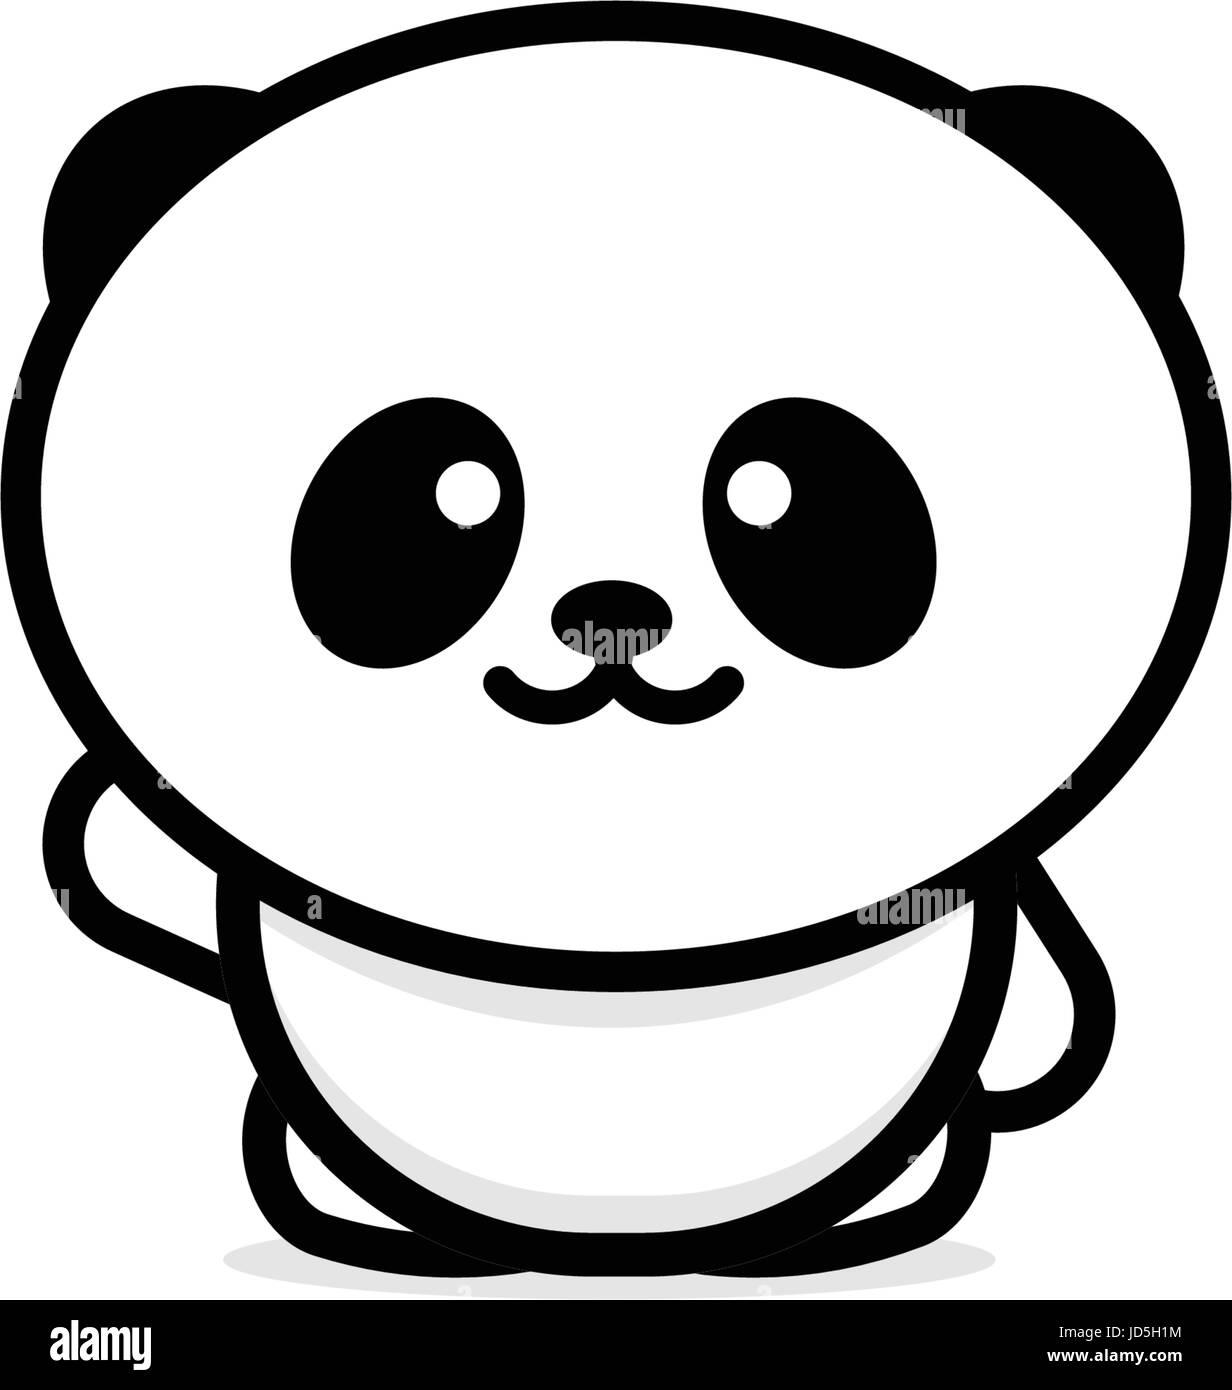 Cute panda welcomes waving his hand vector illustration baby bear cute panda welcomes waving his hand vector illustration baby bear logo new design line art chinese teddy bear black color sign simple image pictu buycottarizona